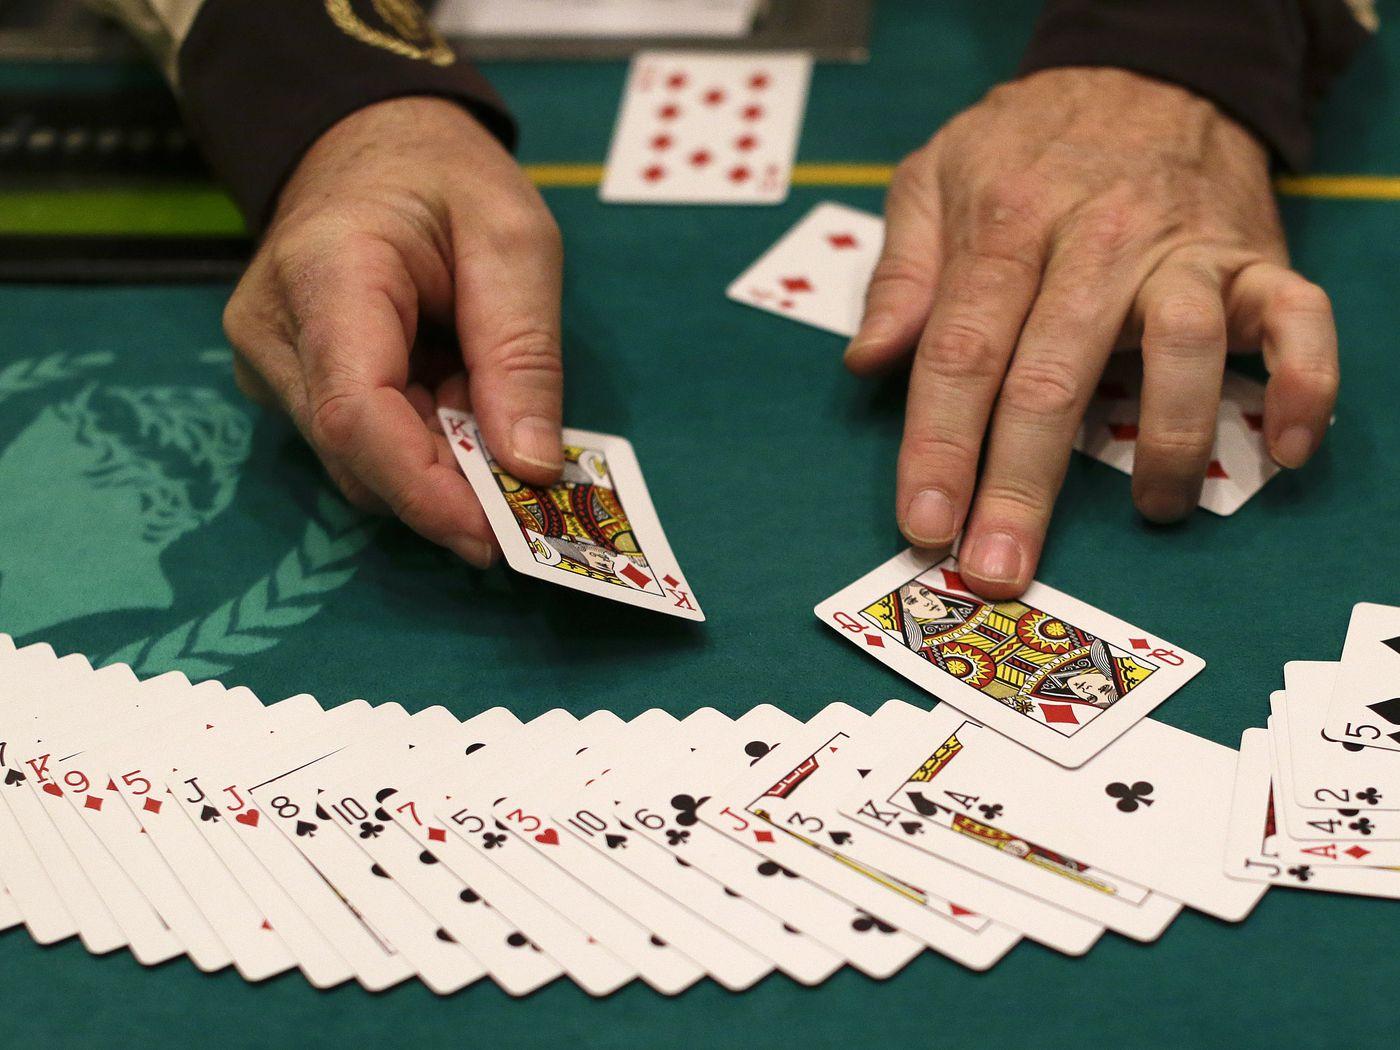 Push gambling casinos 252646